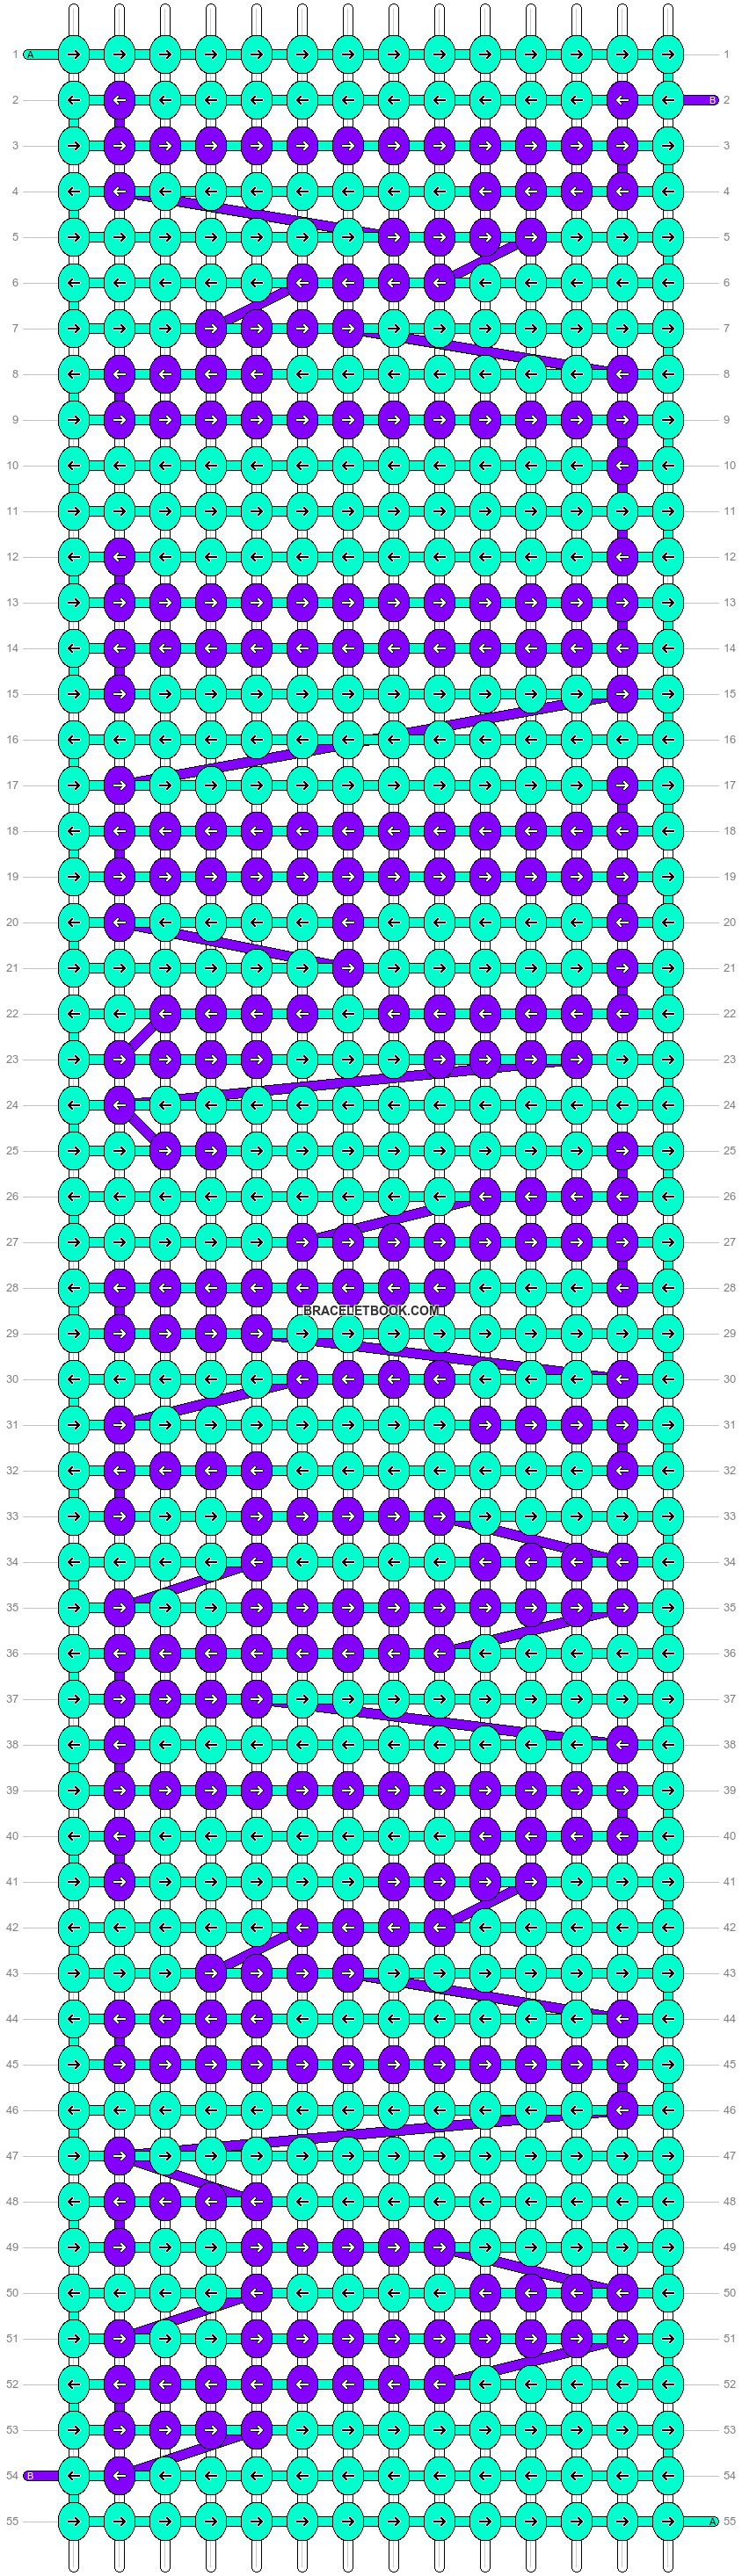 Alpha pattern #7549 pattern